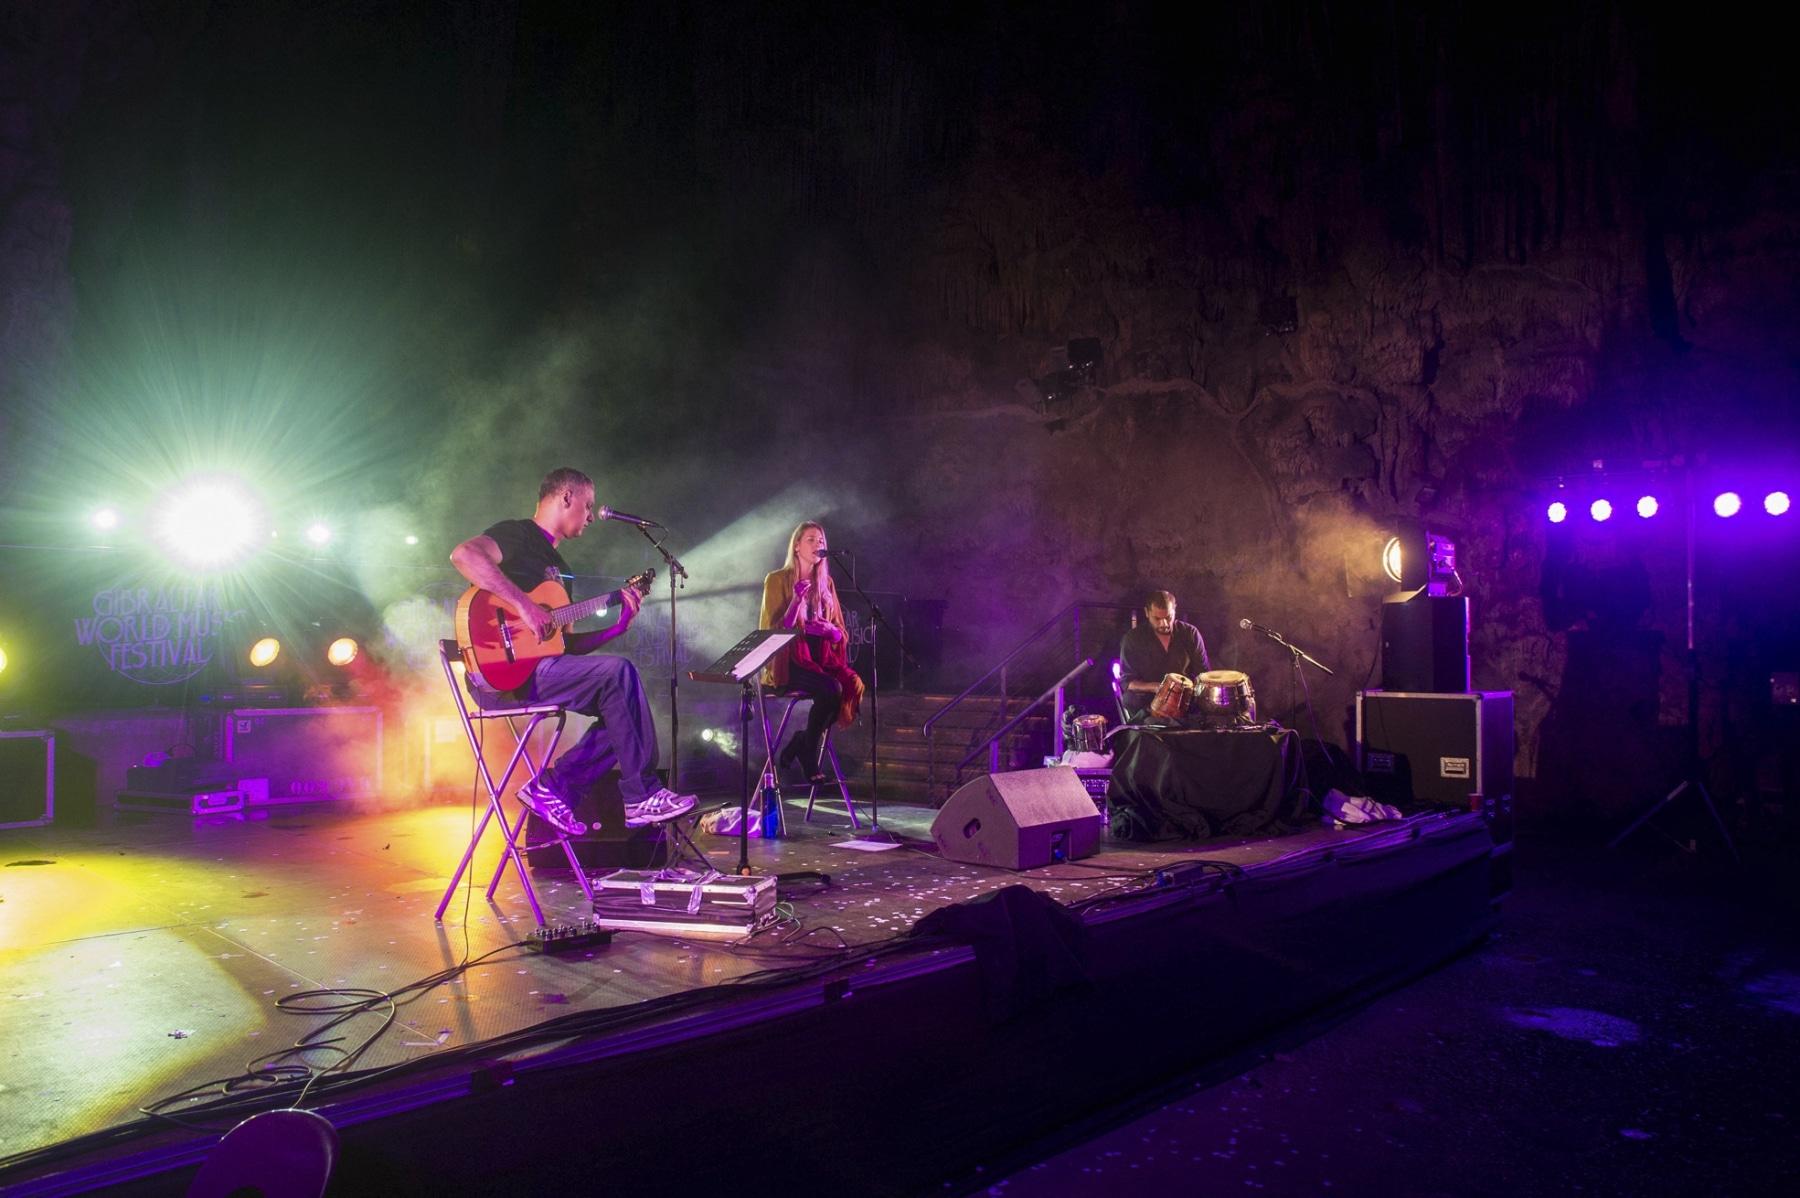 19-junio-gibraltar-world-music-festival38_14463183572_o